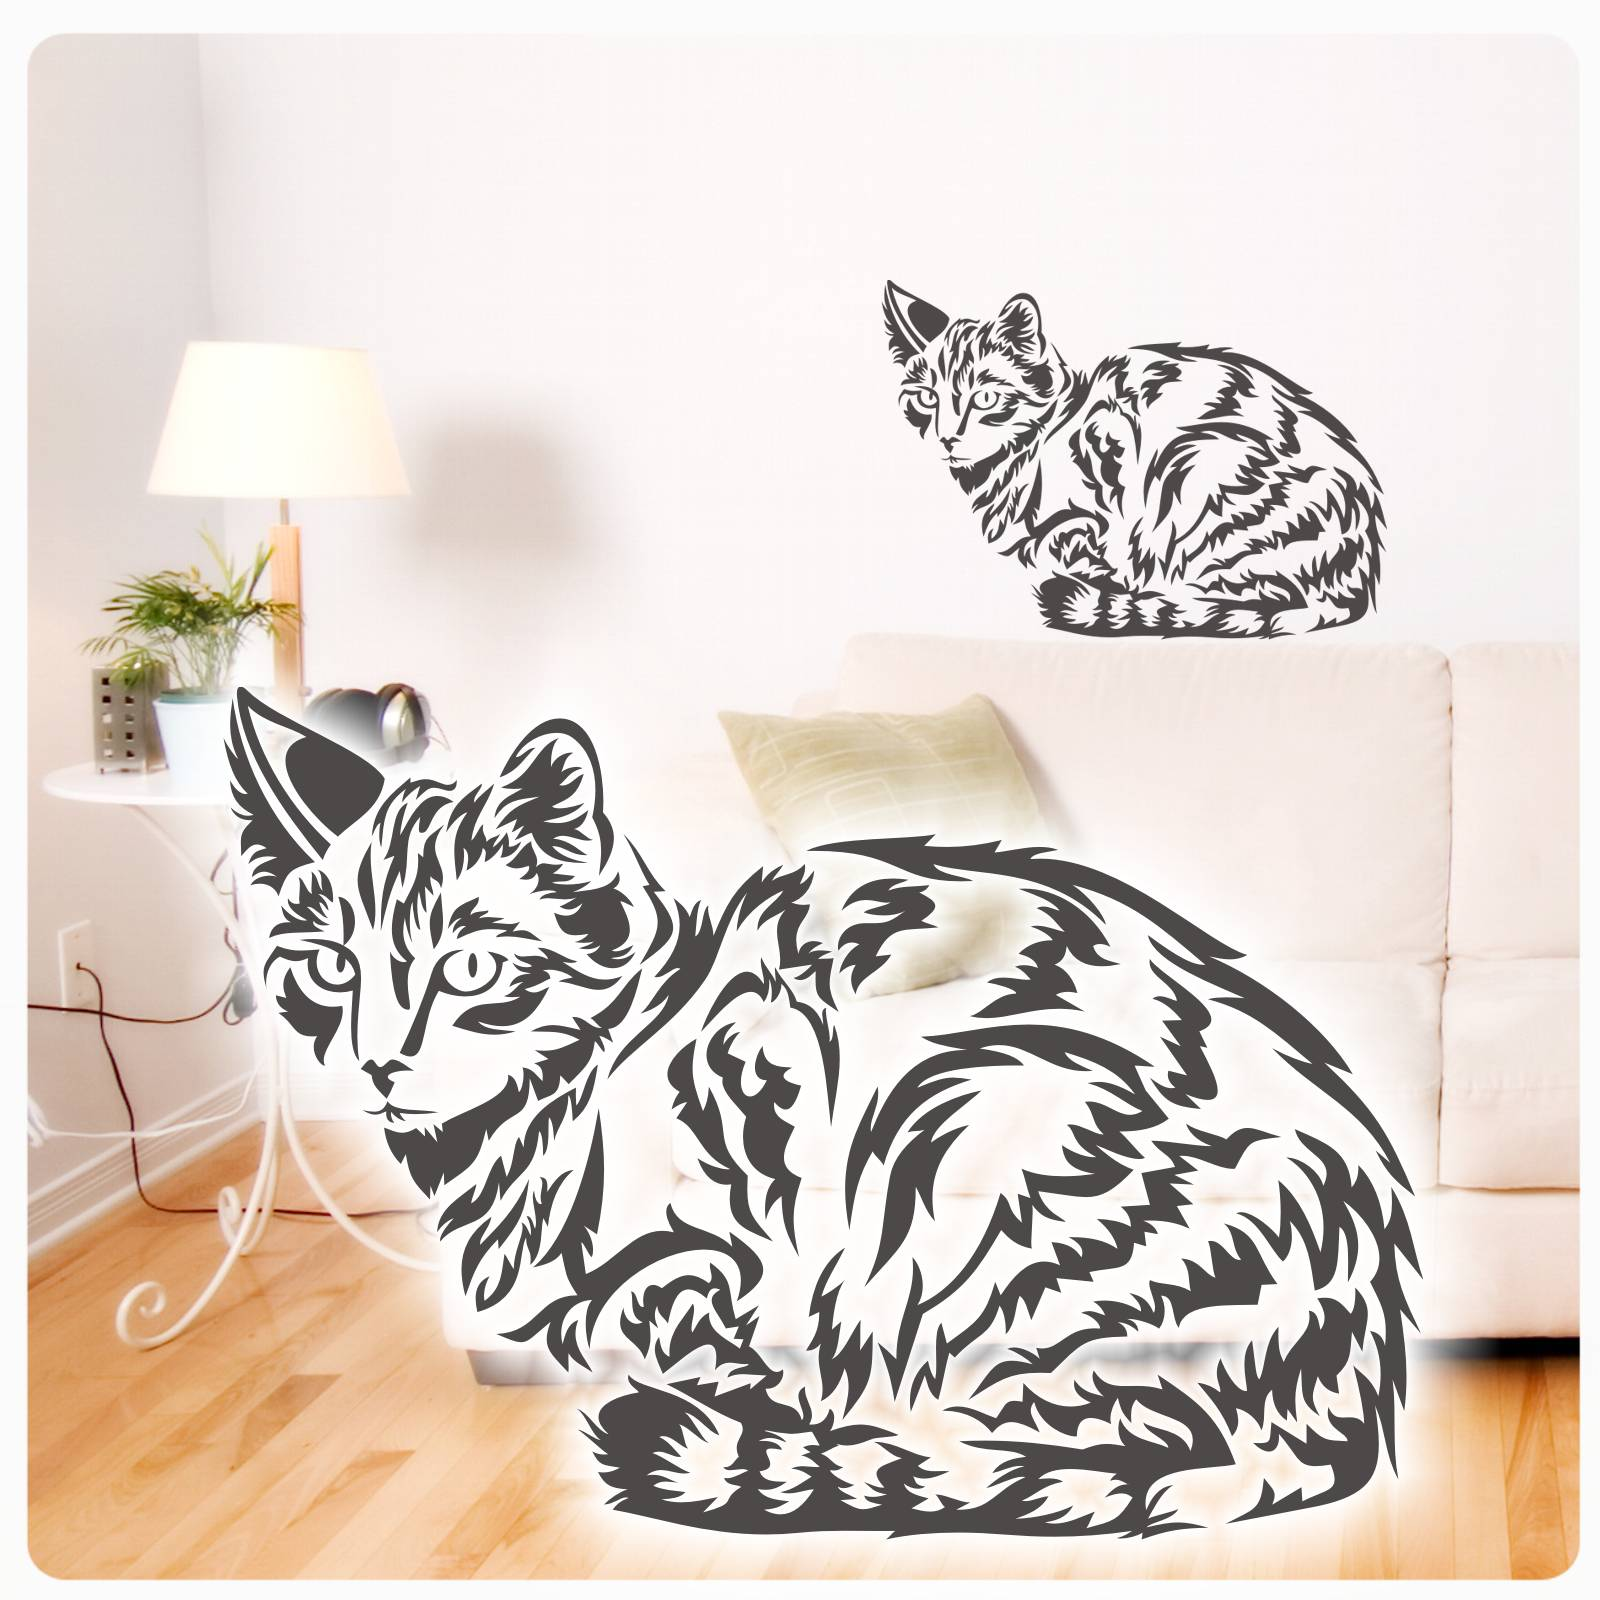 Wunderbar Wandtattoo Katzen Referenz Von Tigerkatze Katze